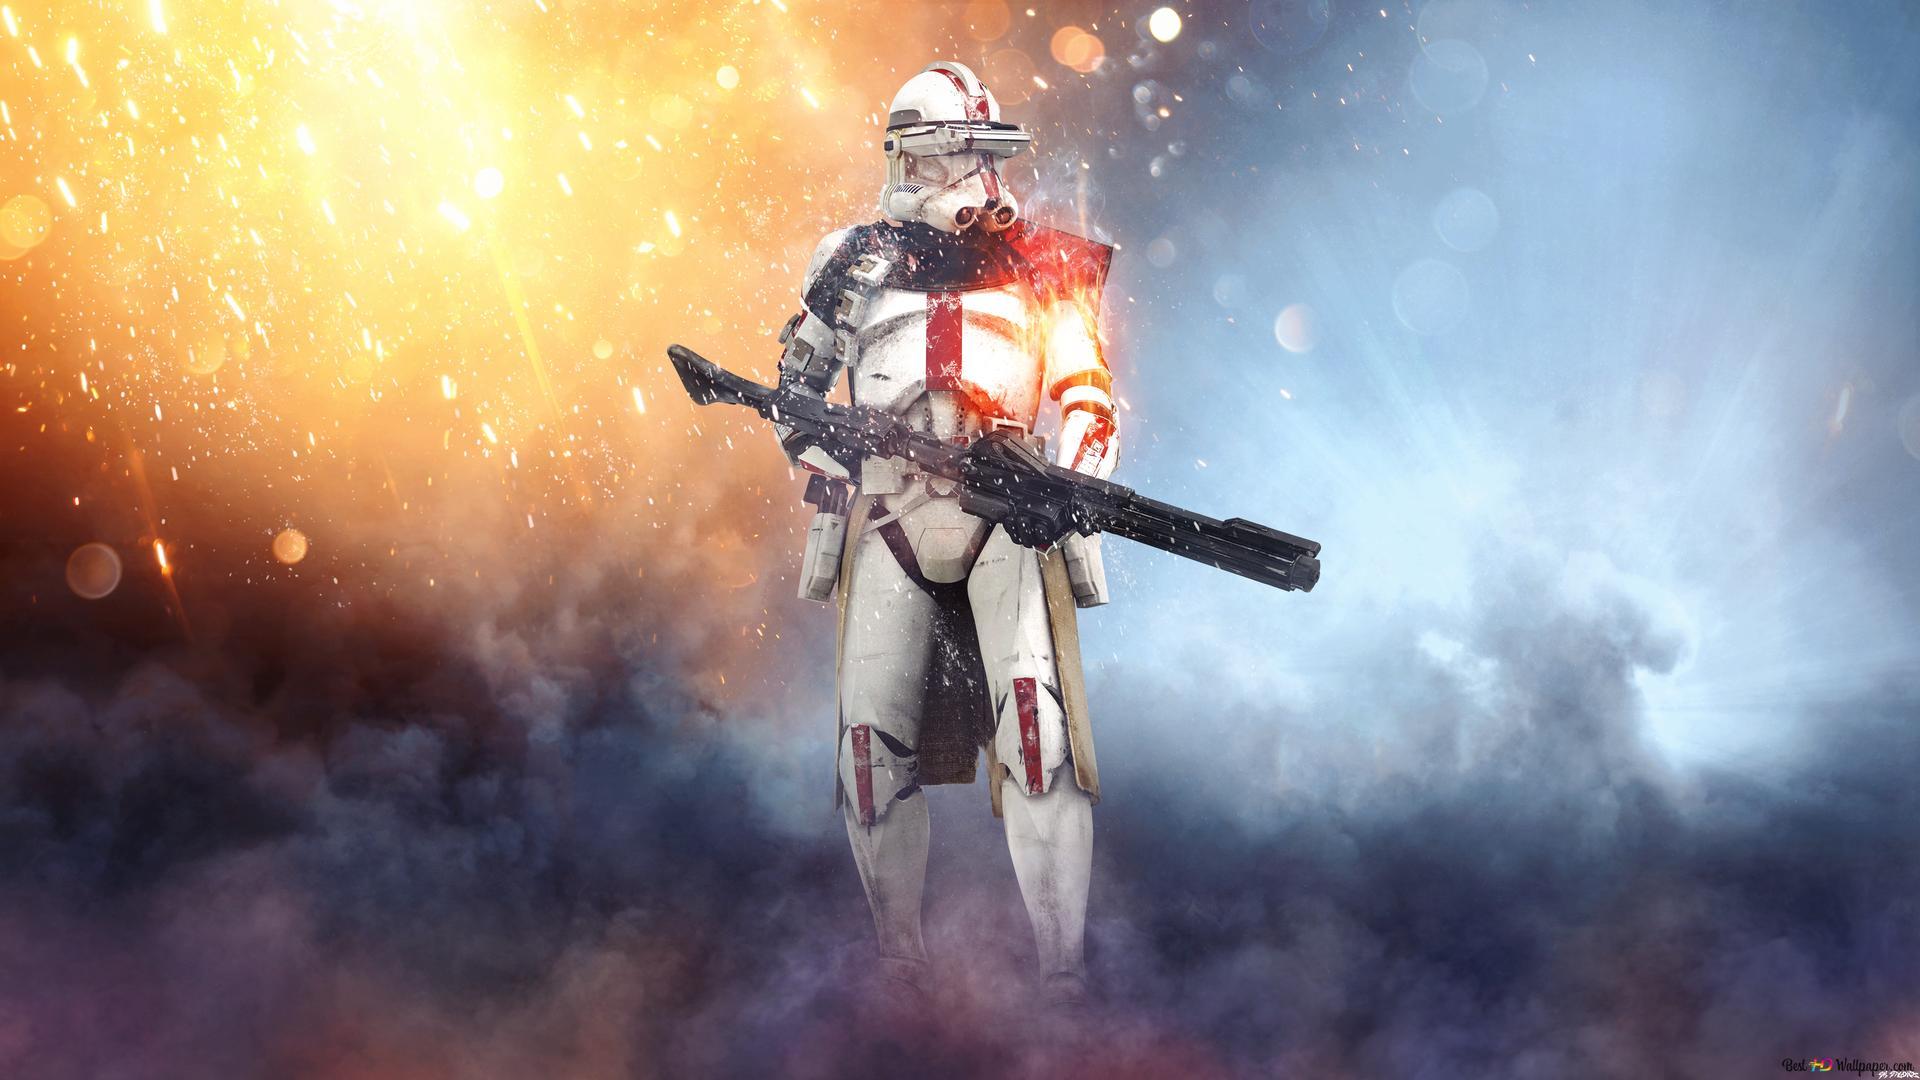 Stormtrooper HD wallpaper download